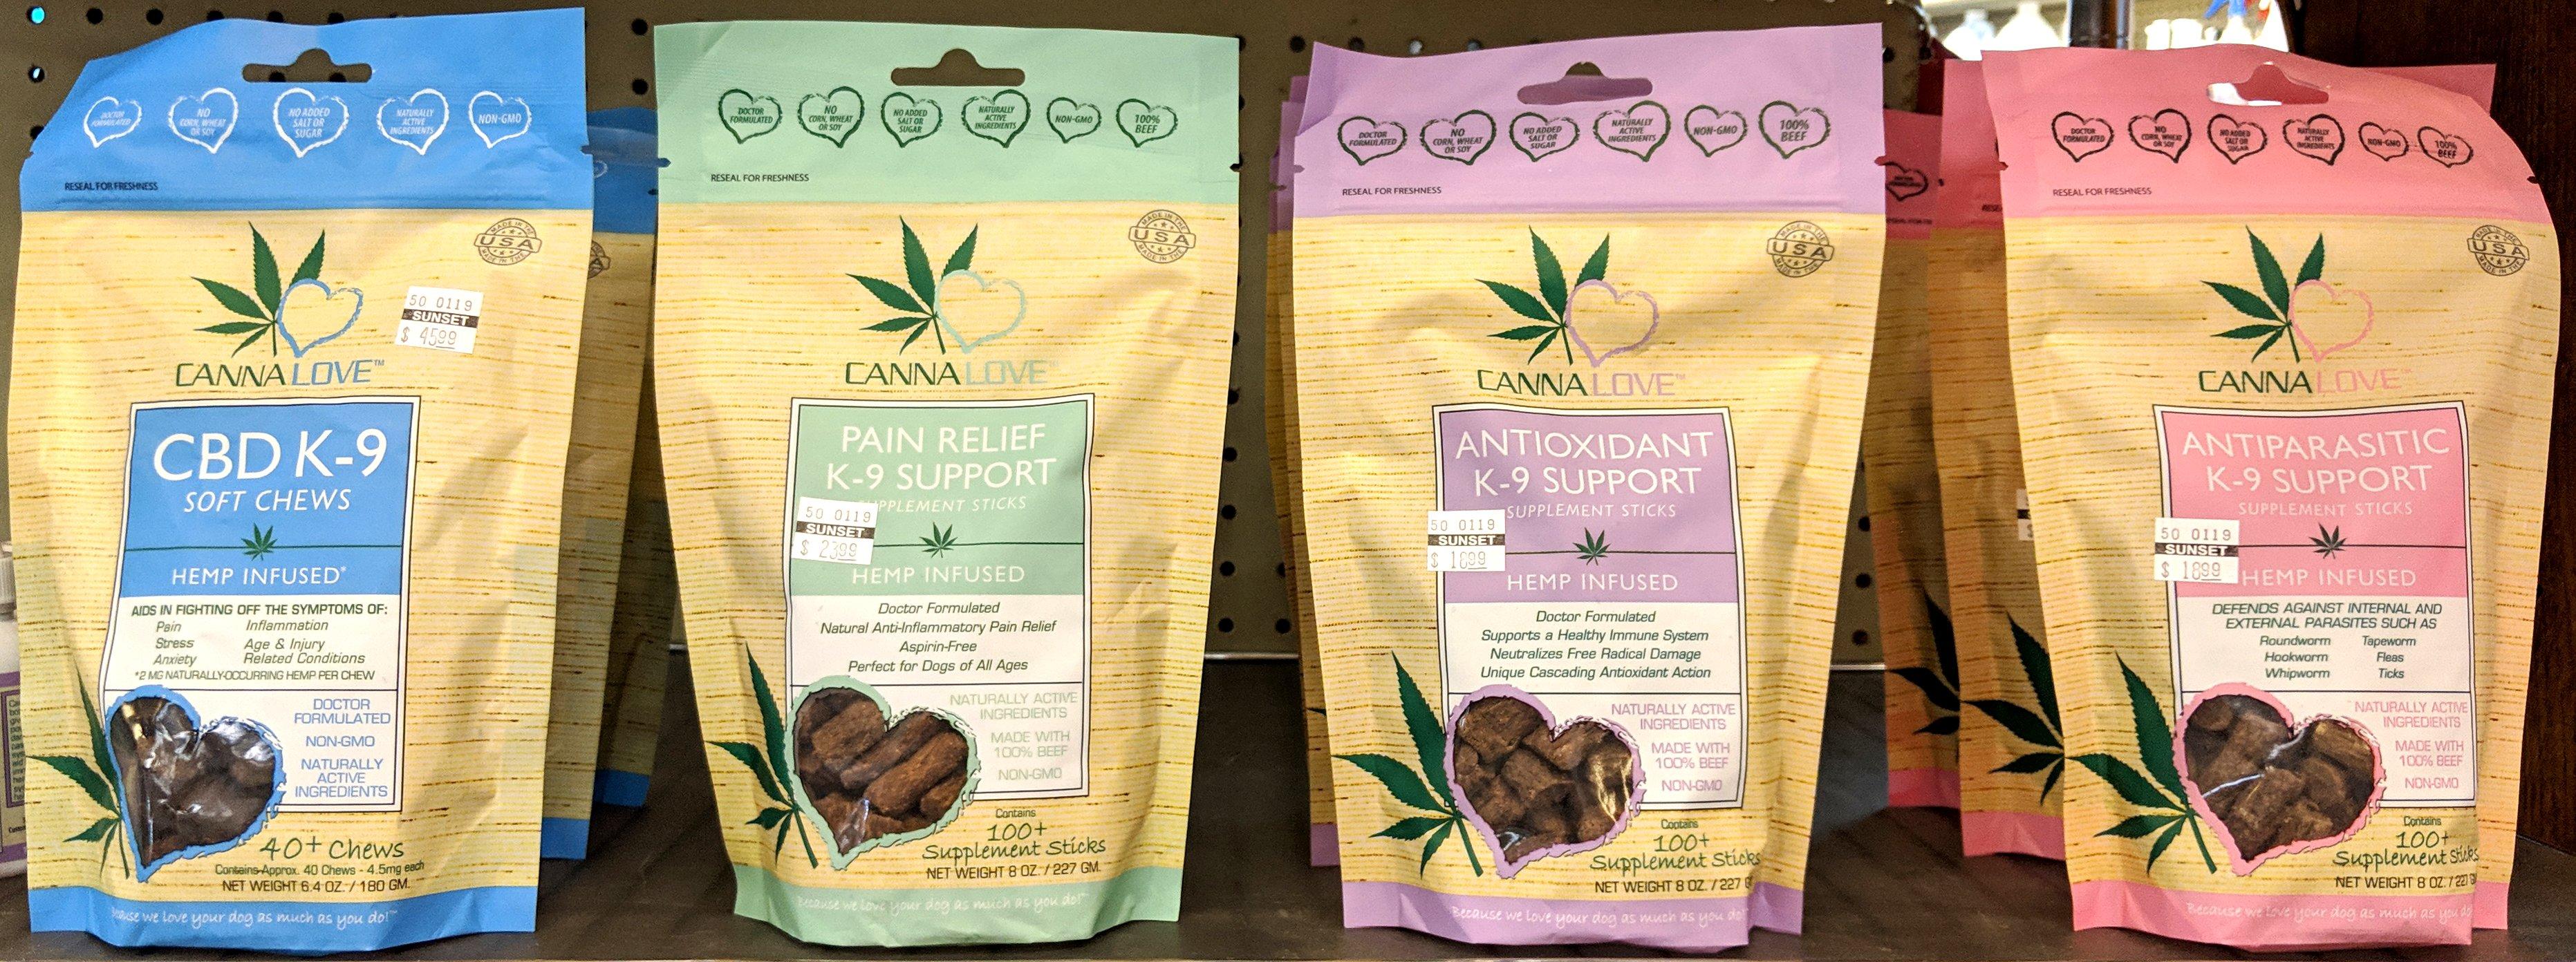 CBD K-9 Soft Chews, CBD Pain Relief K-9 Support, CBD Antioxidant K-9 Support, CBD Antiparasitic K-9 Support